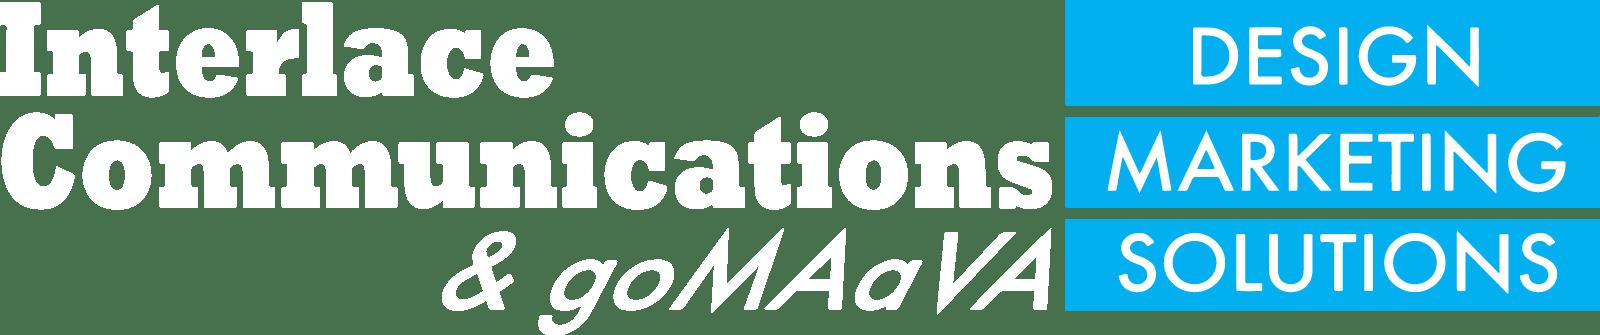 Interlace Communications Logo